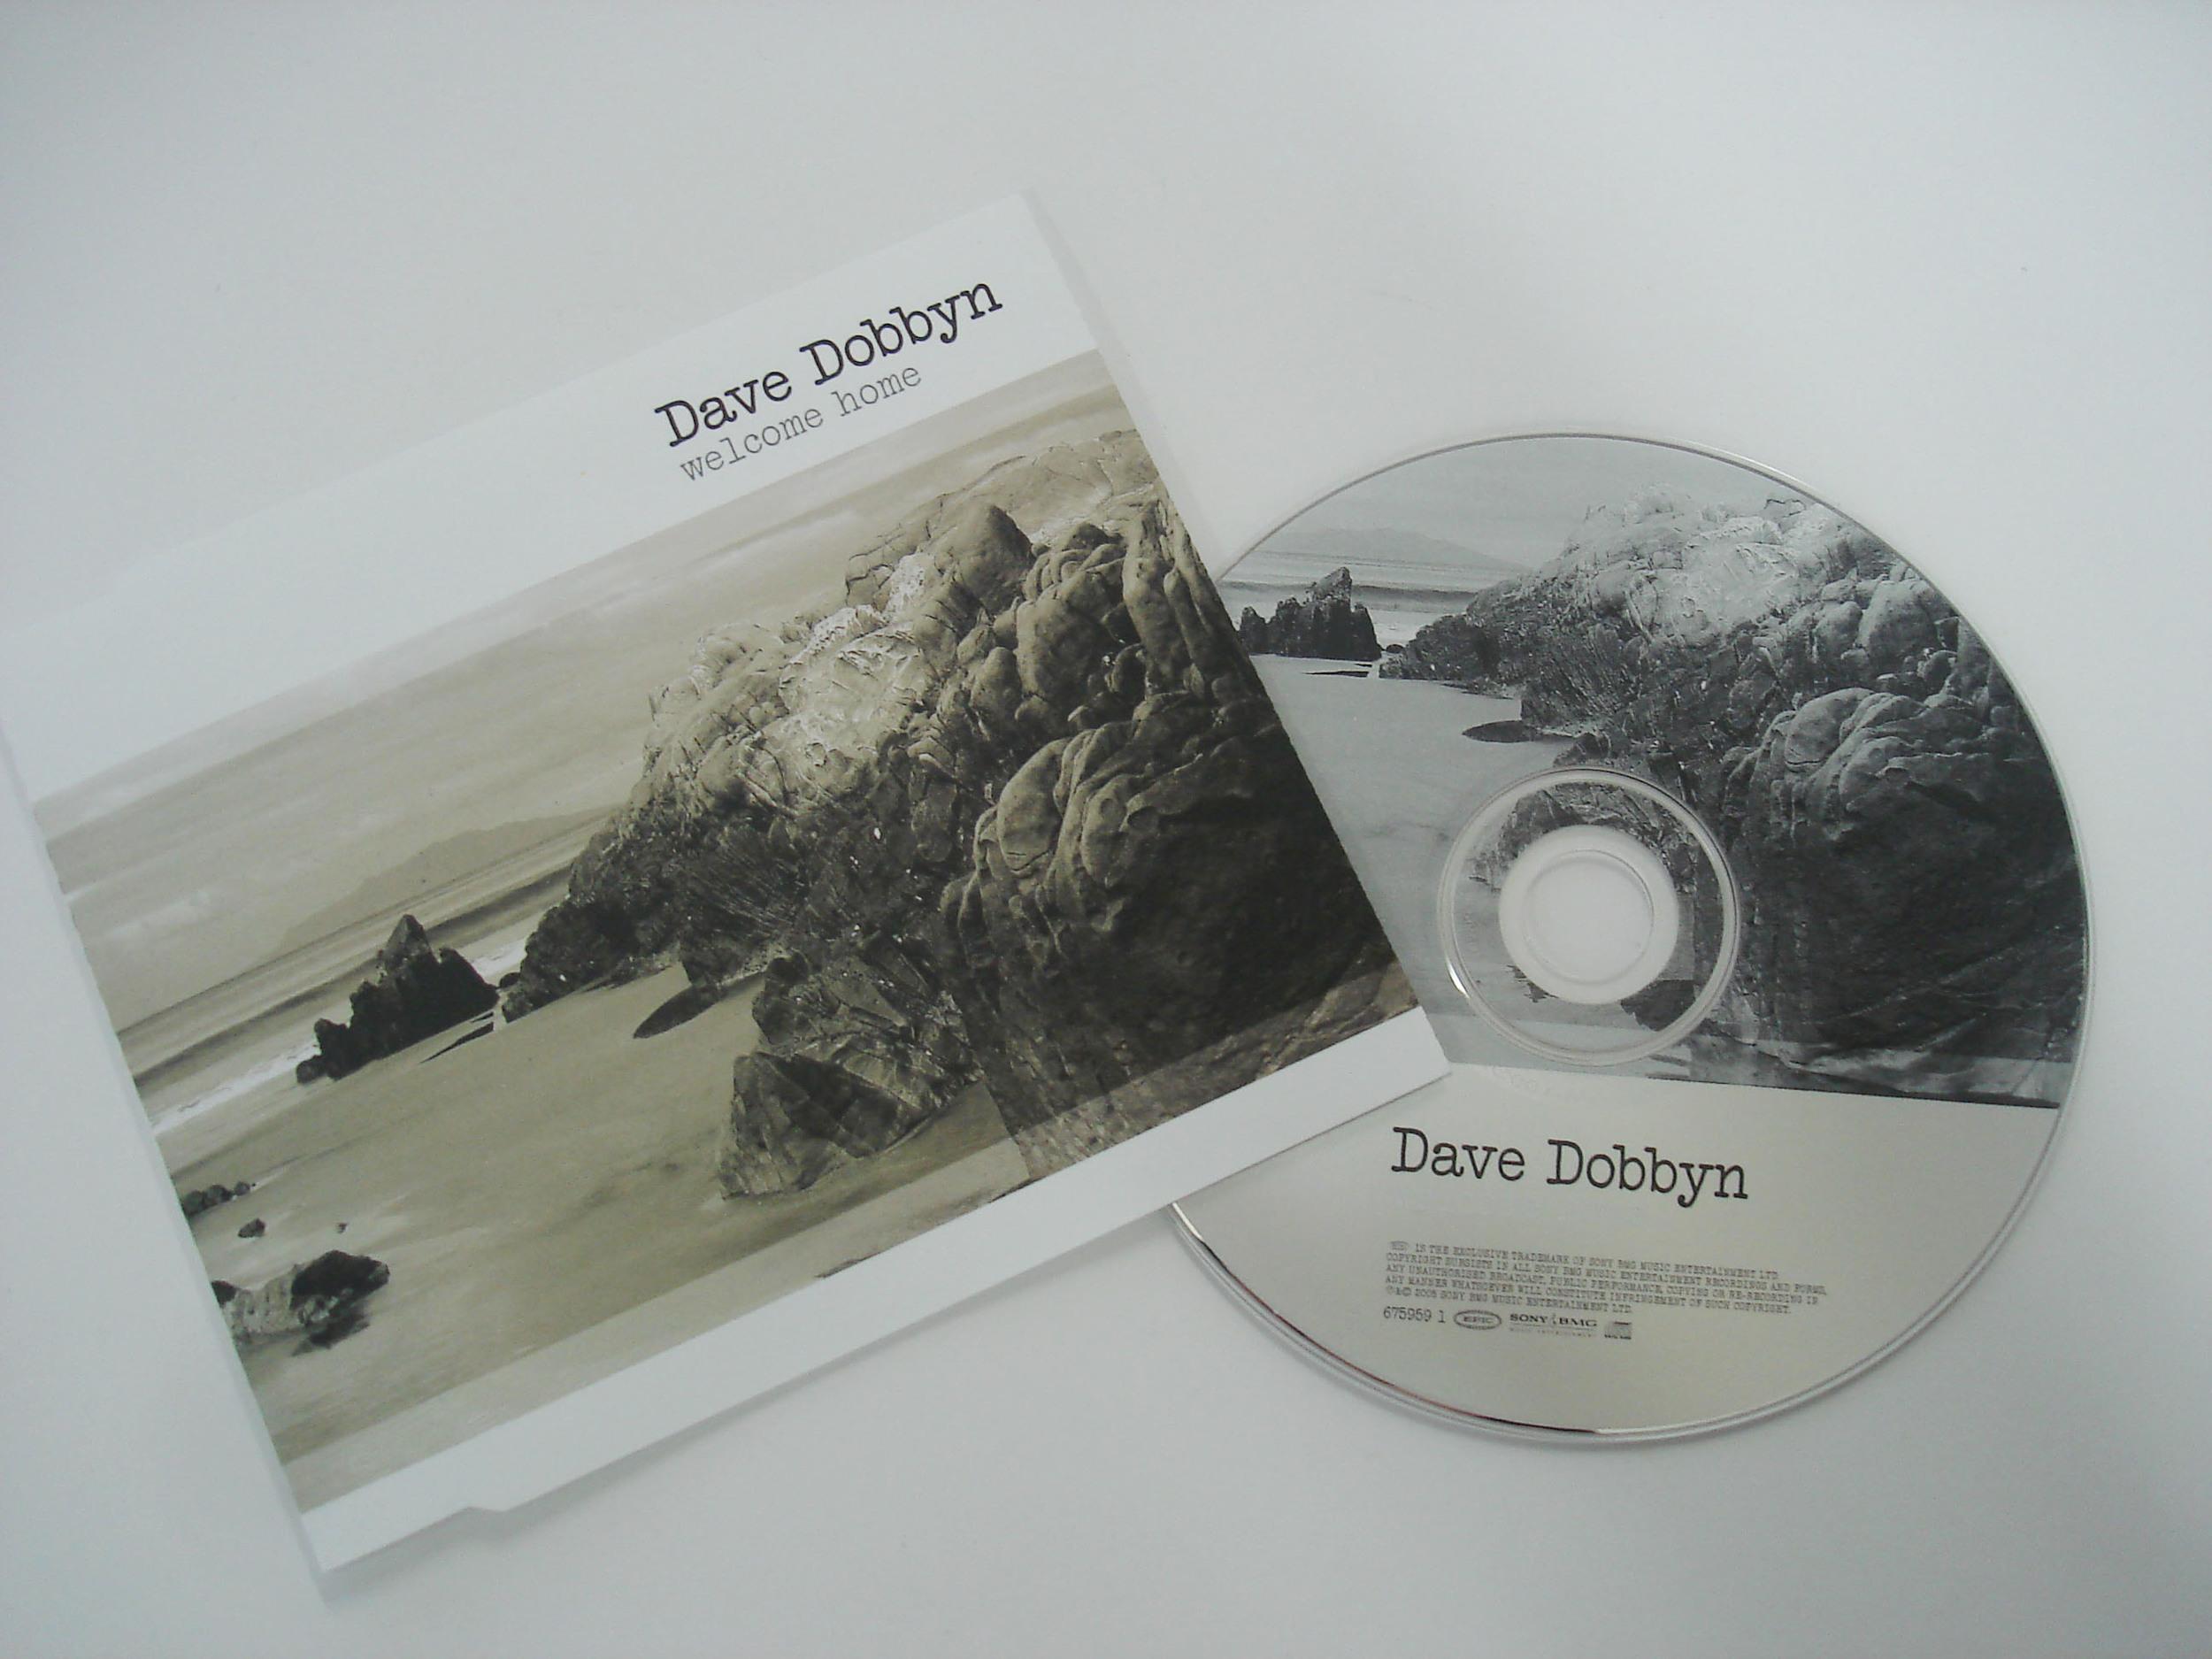 Dave Dobbyn - Beside You